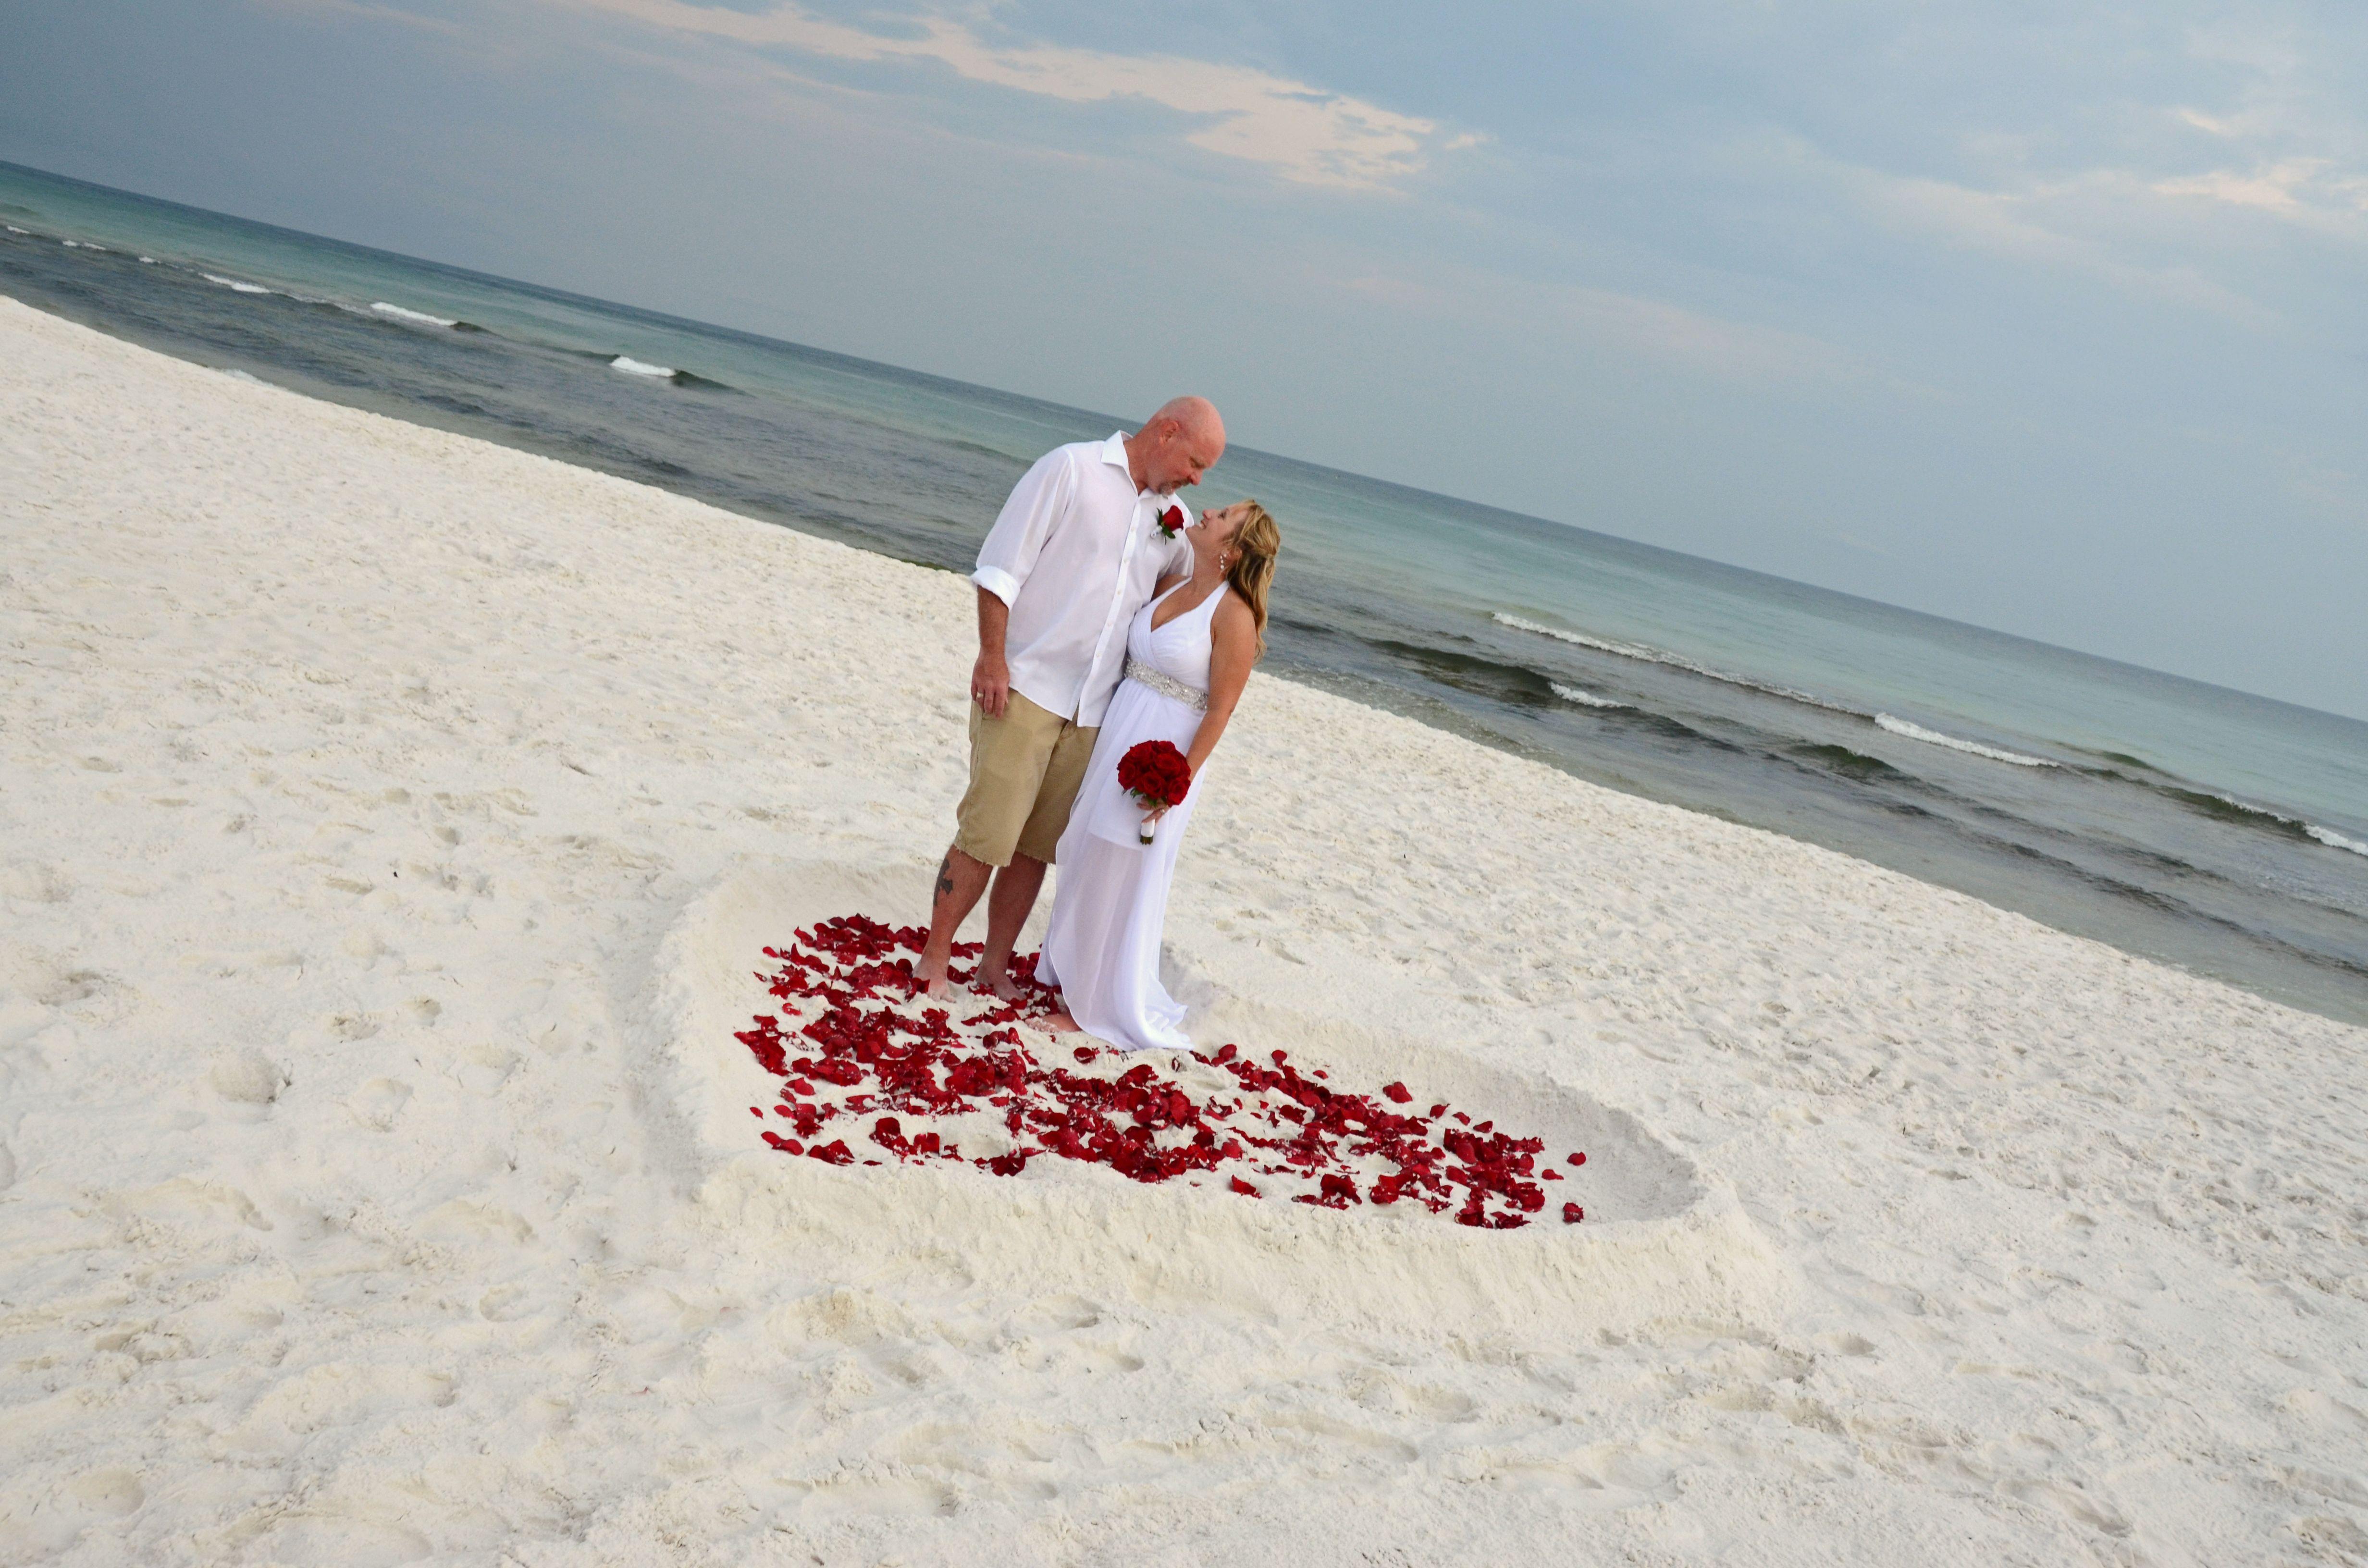 Beach weddings fort walton beach wedding packages sunset beach - Red Rose Petal Filled Heart In The Sand Fort Walton Beach Florida Destination Beach Wedding